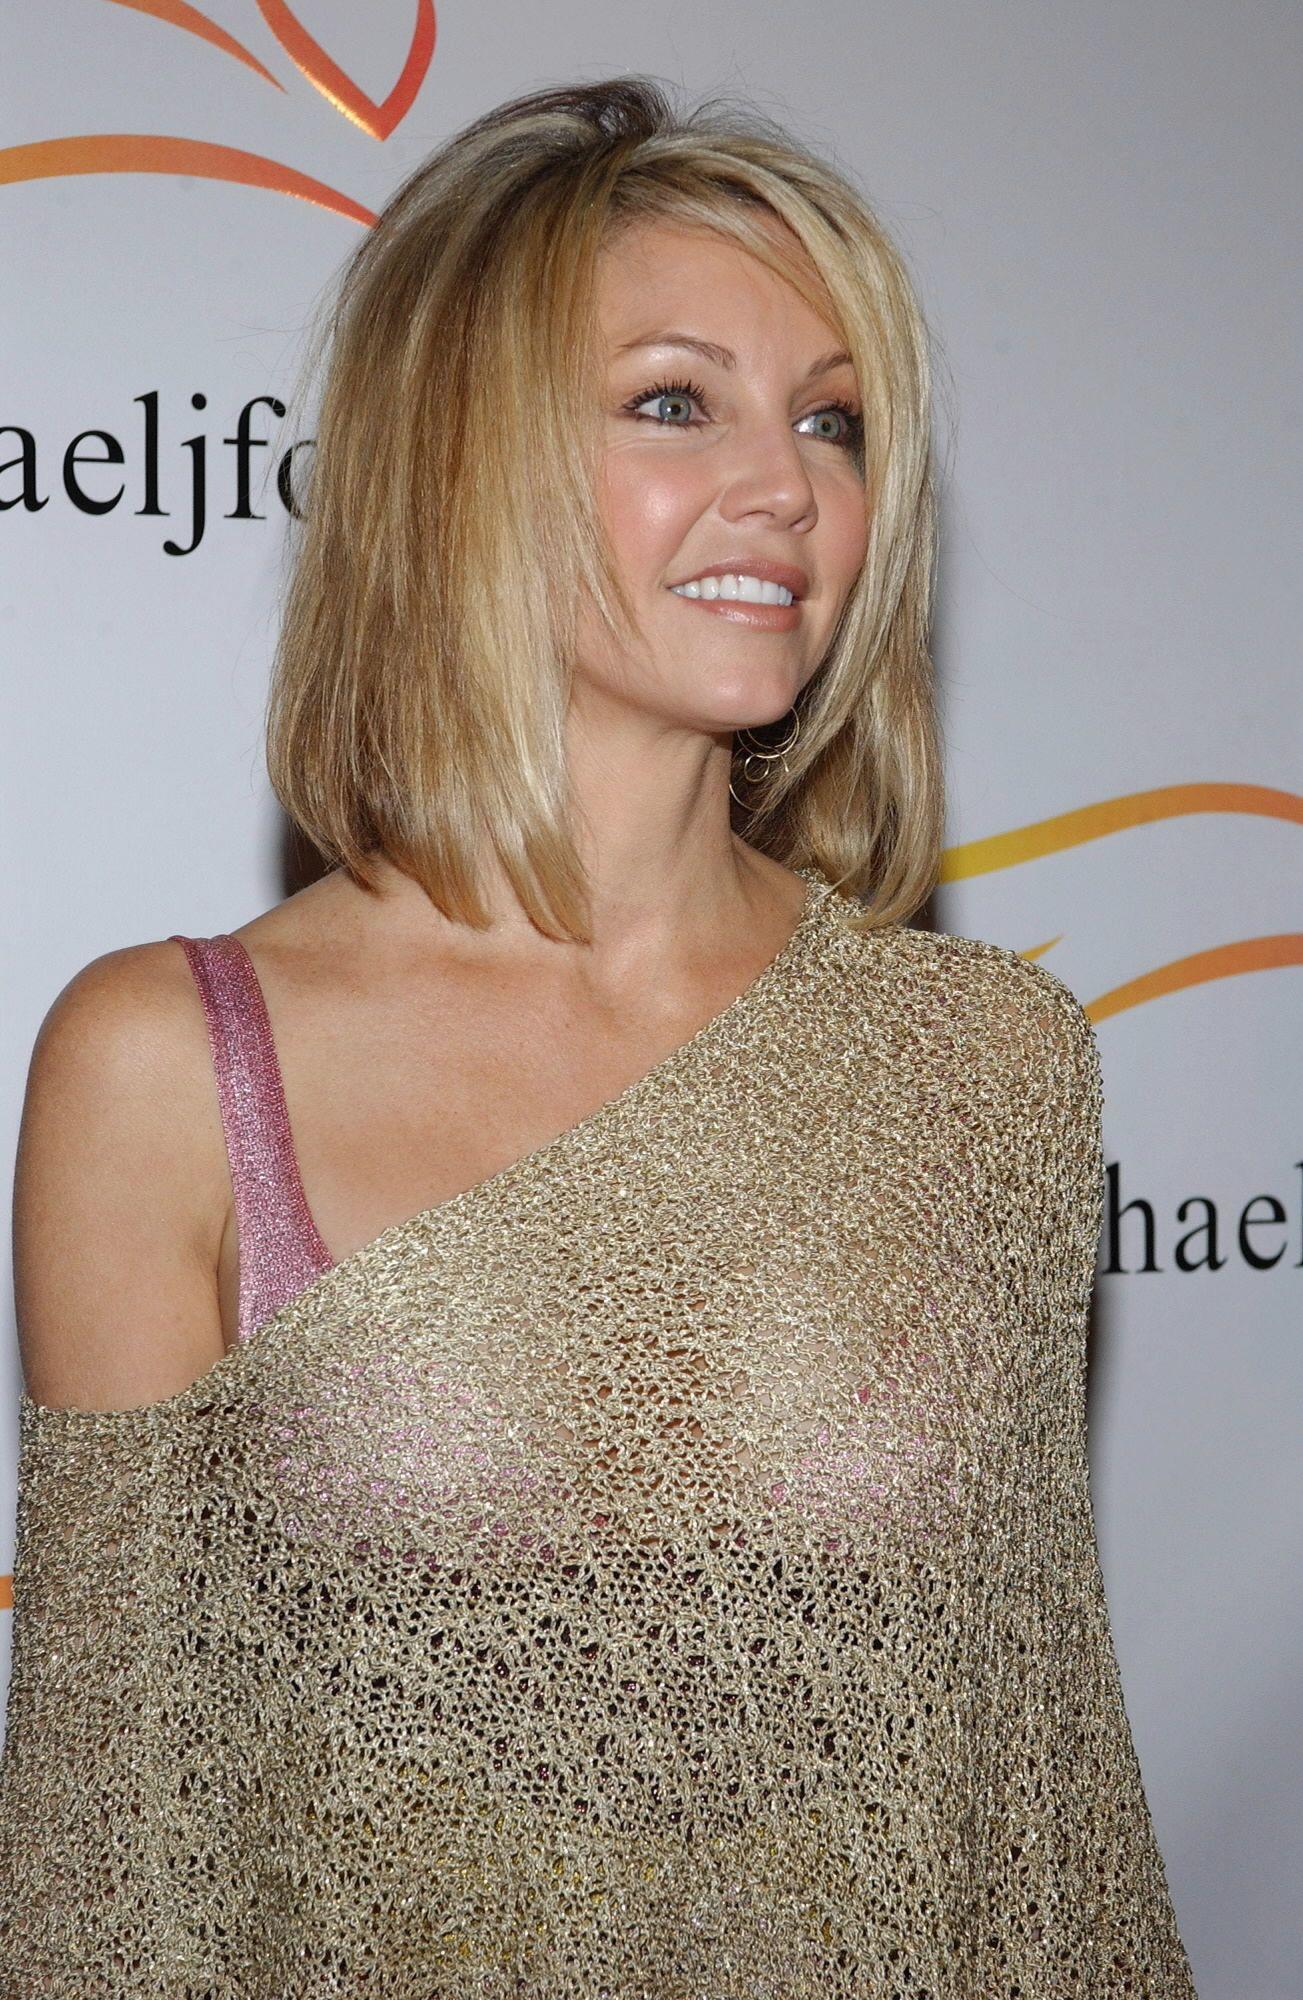 Pleasing 1000 Images About Heather Locklear On Pinterest Short Hairstyles Gunalazisus